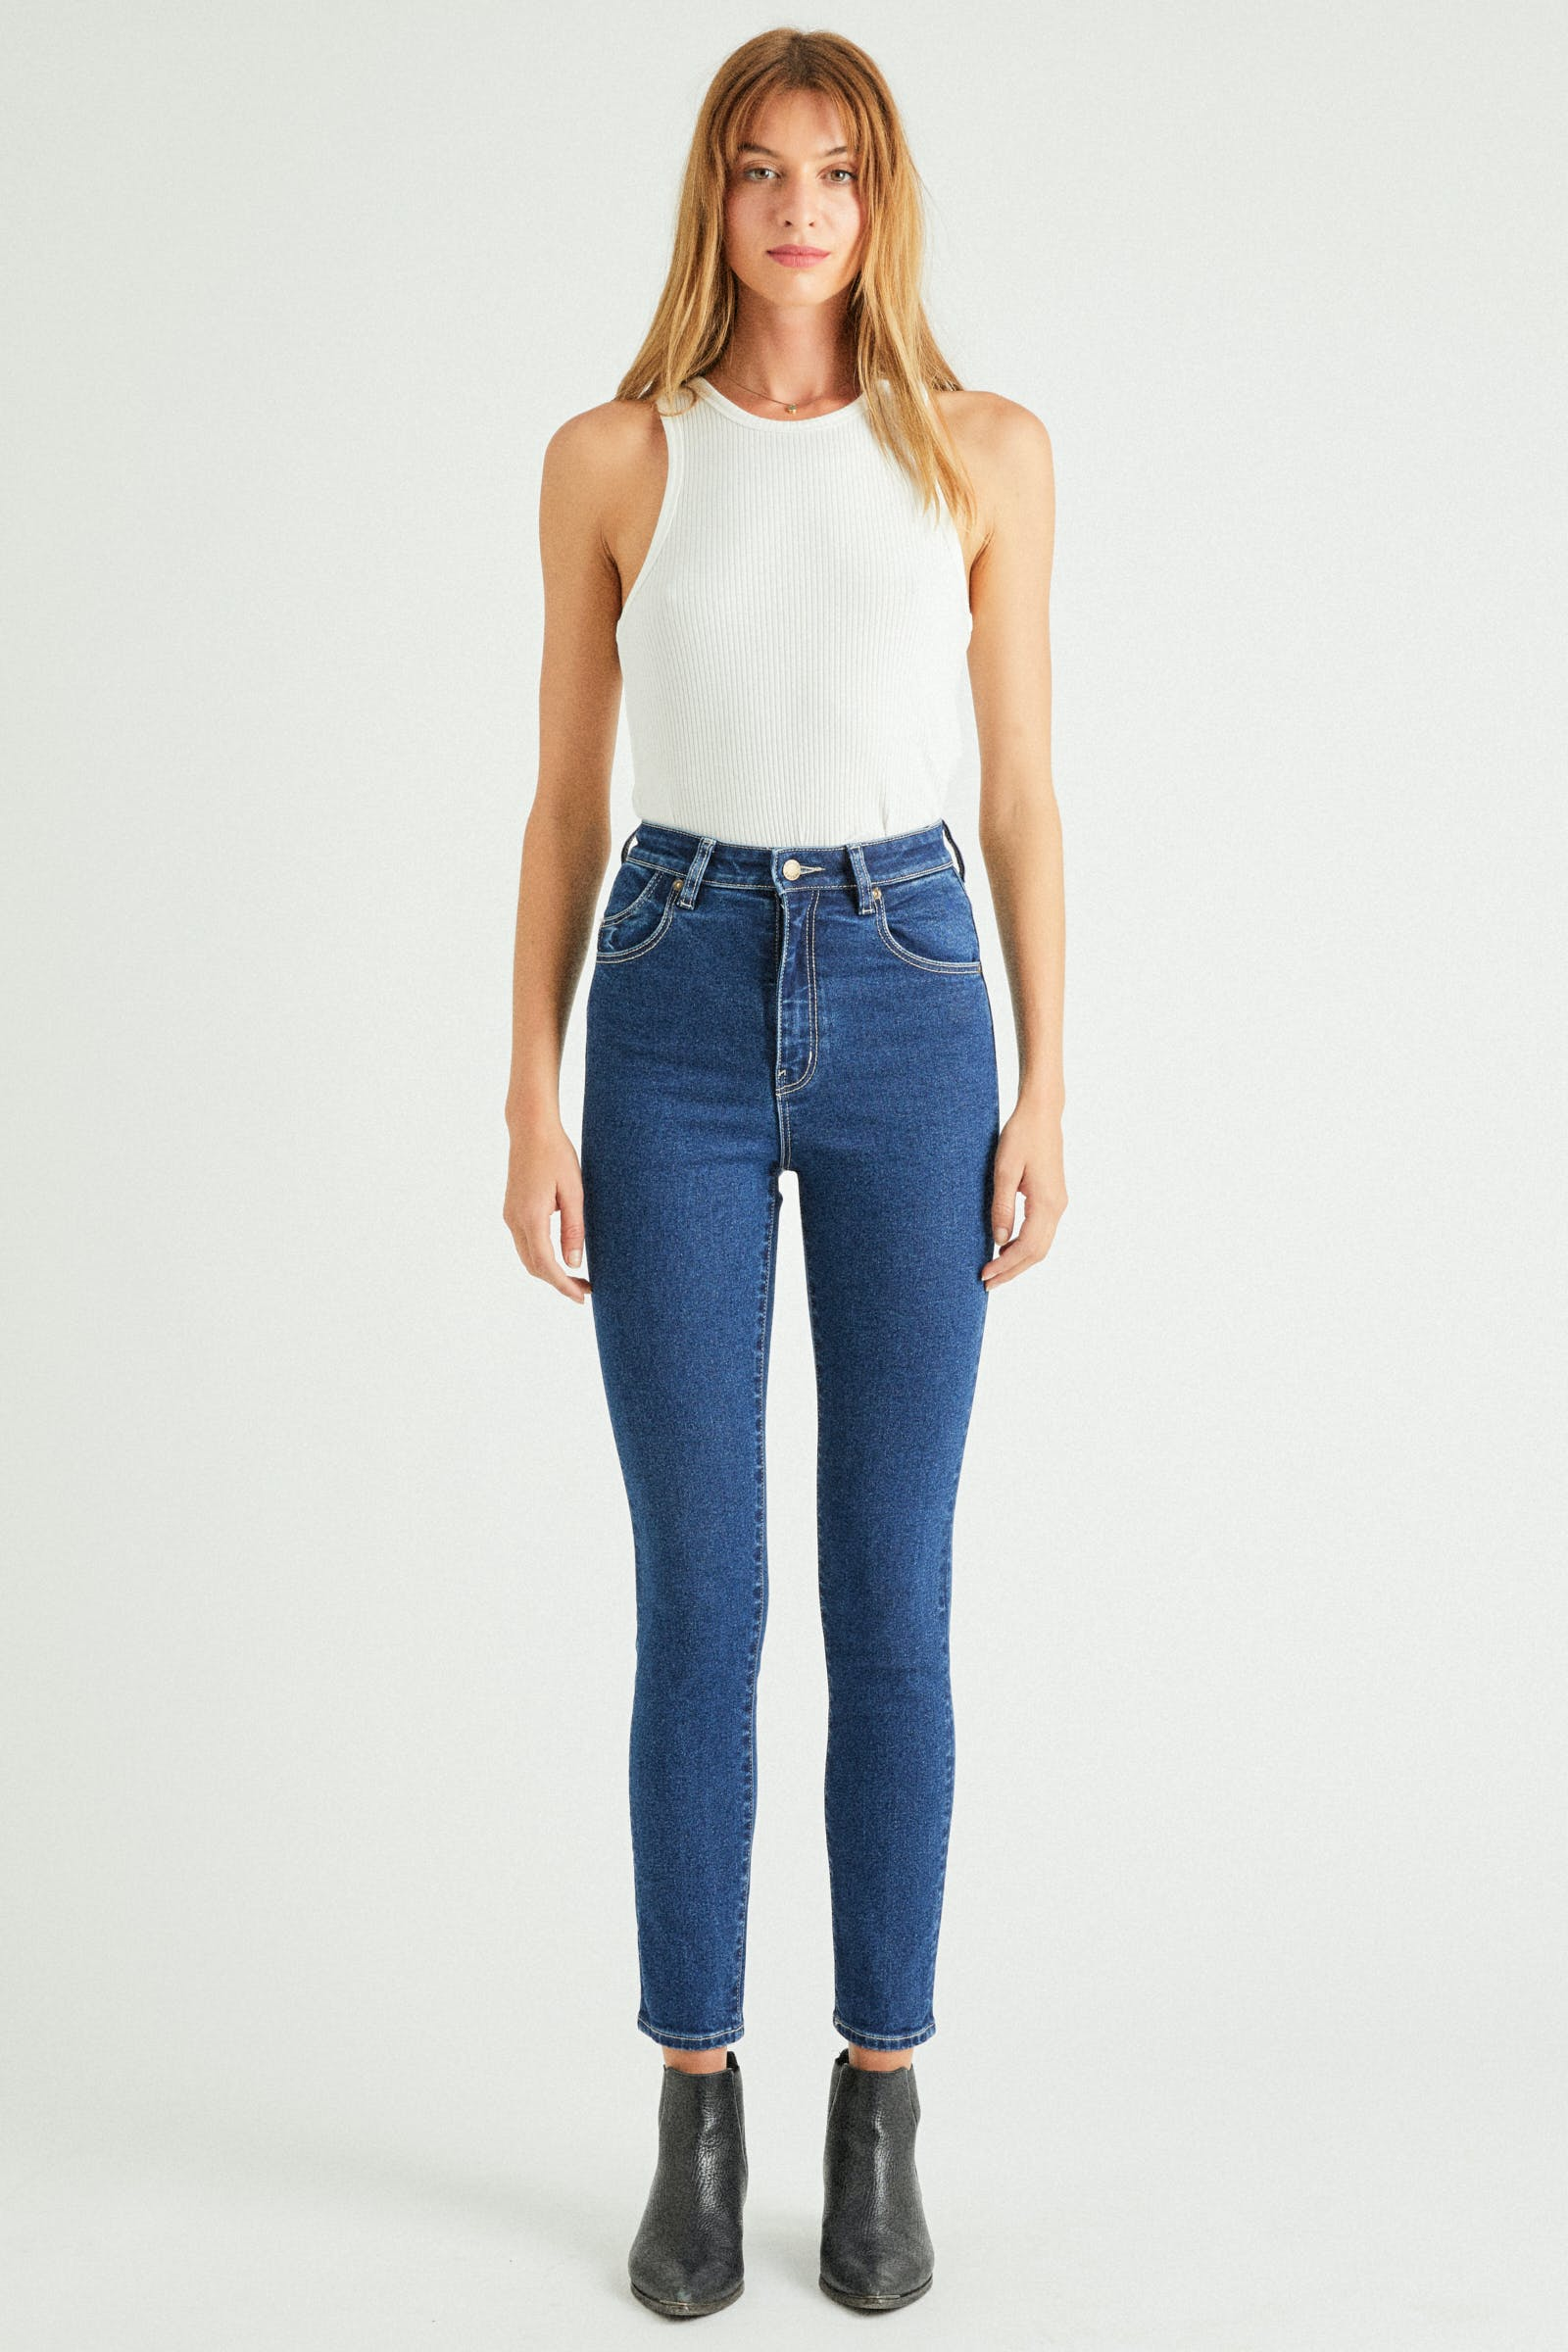 Rolla's Eastcoast Skinny Jean